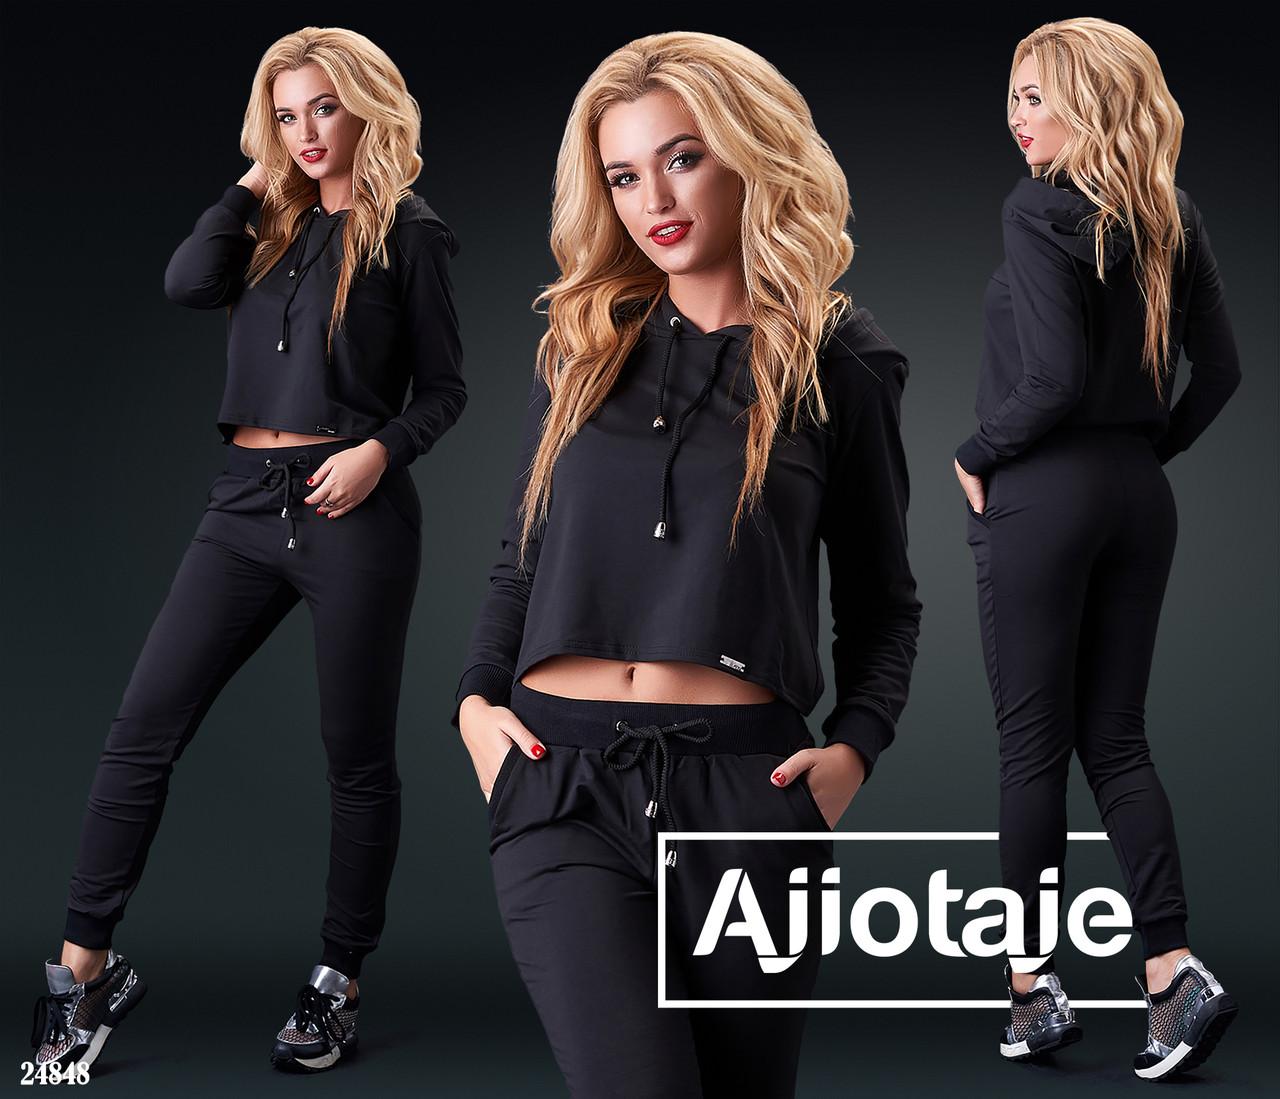 Спортивный костюм женский норма 42-48  Ajiotaje